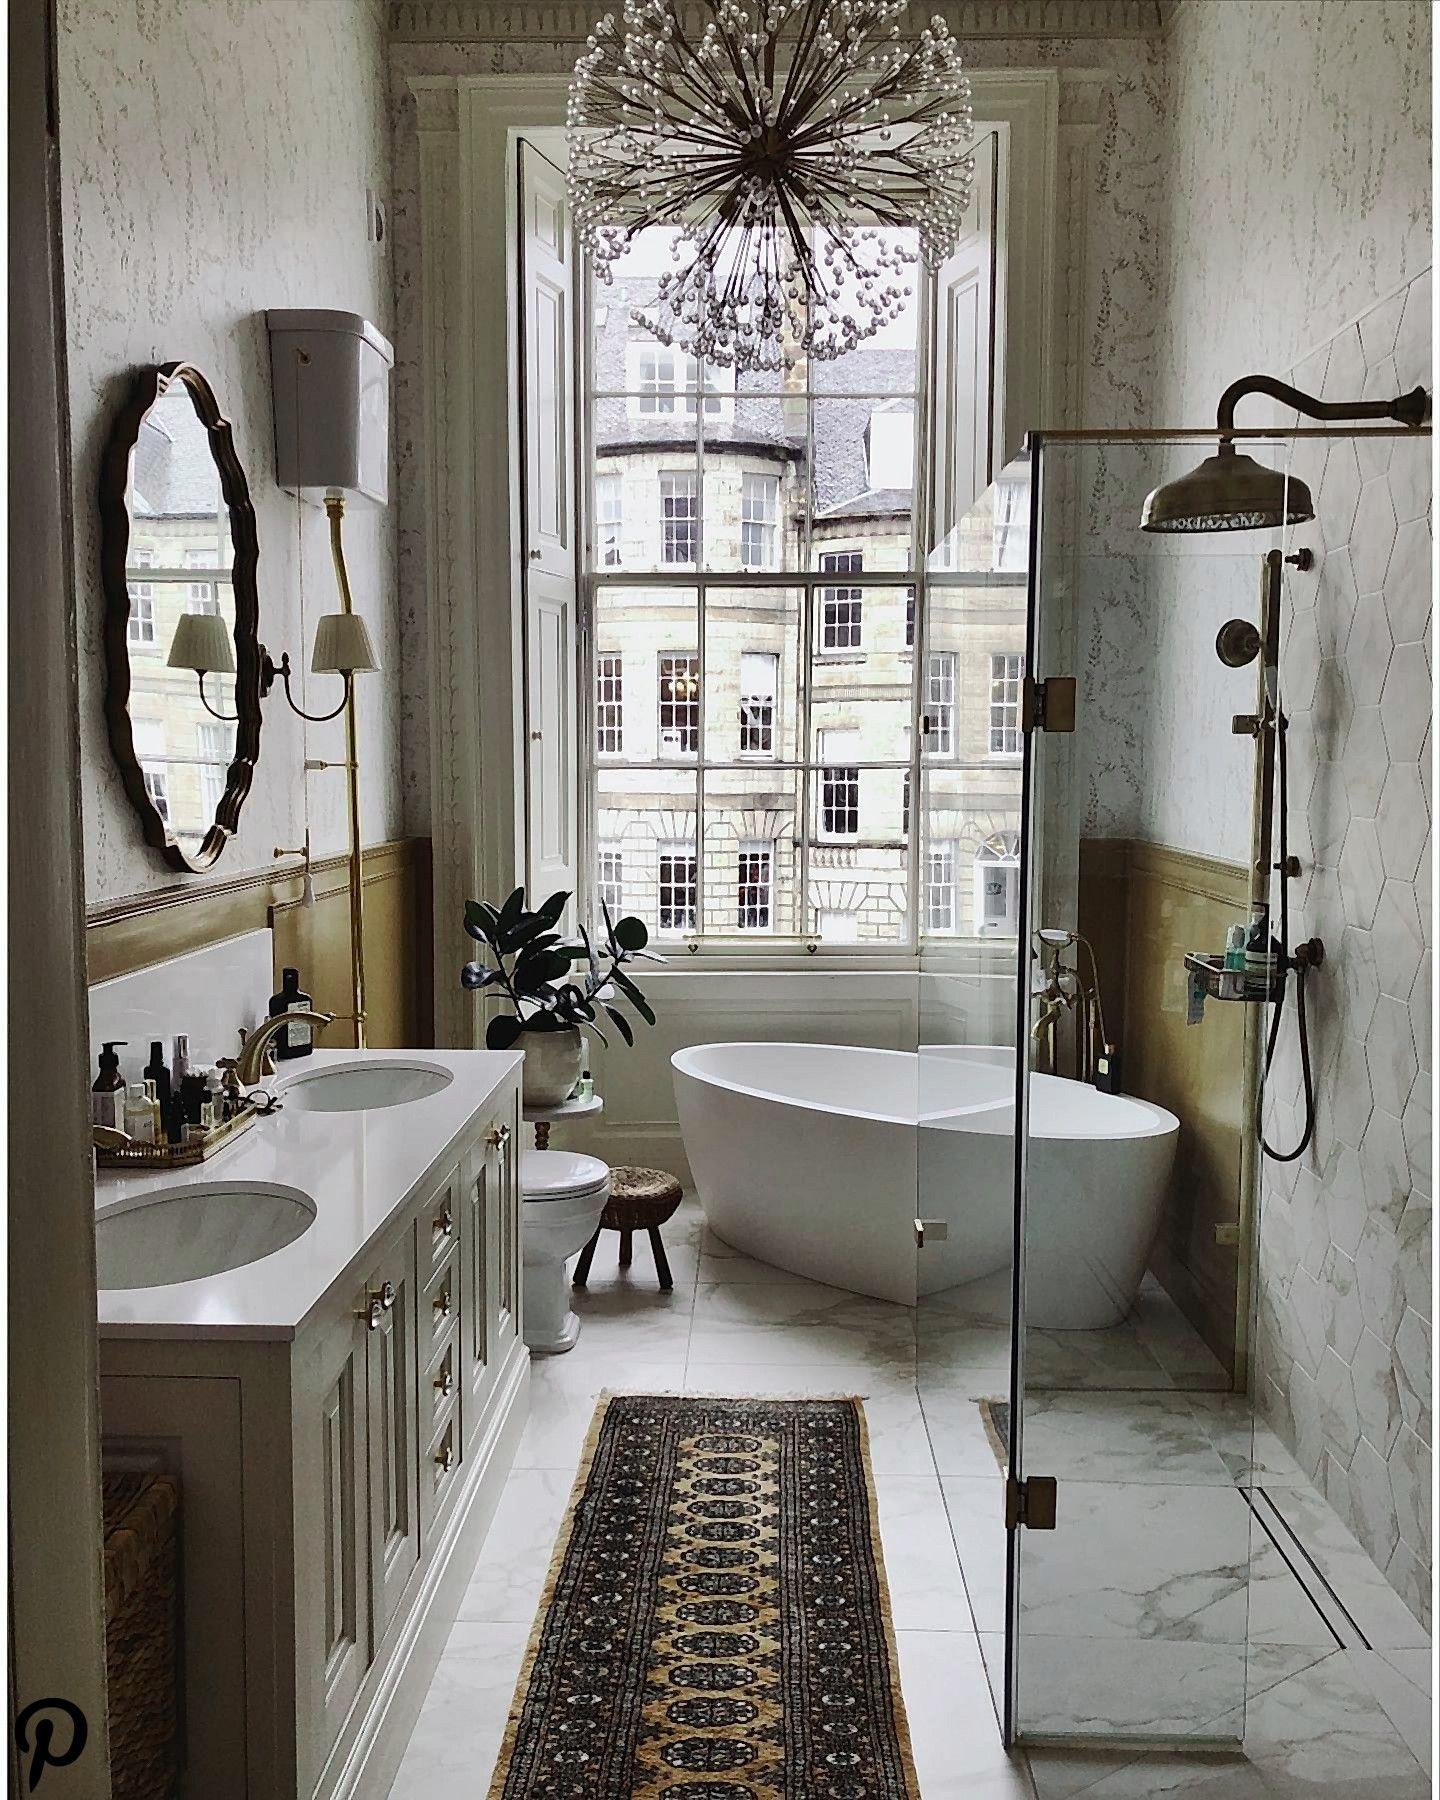 Interiors By Lisa Guest Shares An Edinburgh Renovation We Absolutely Adore Remainslight Guest Bathroom Remodel Bathroom Inspiration Bathroom Interior Design